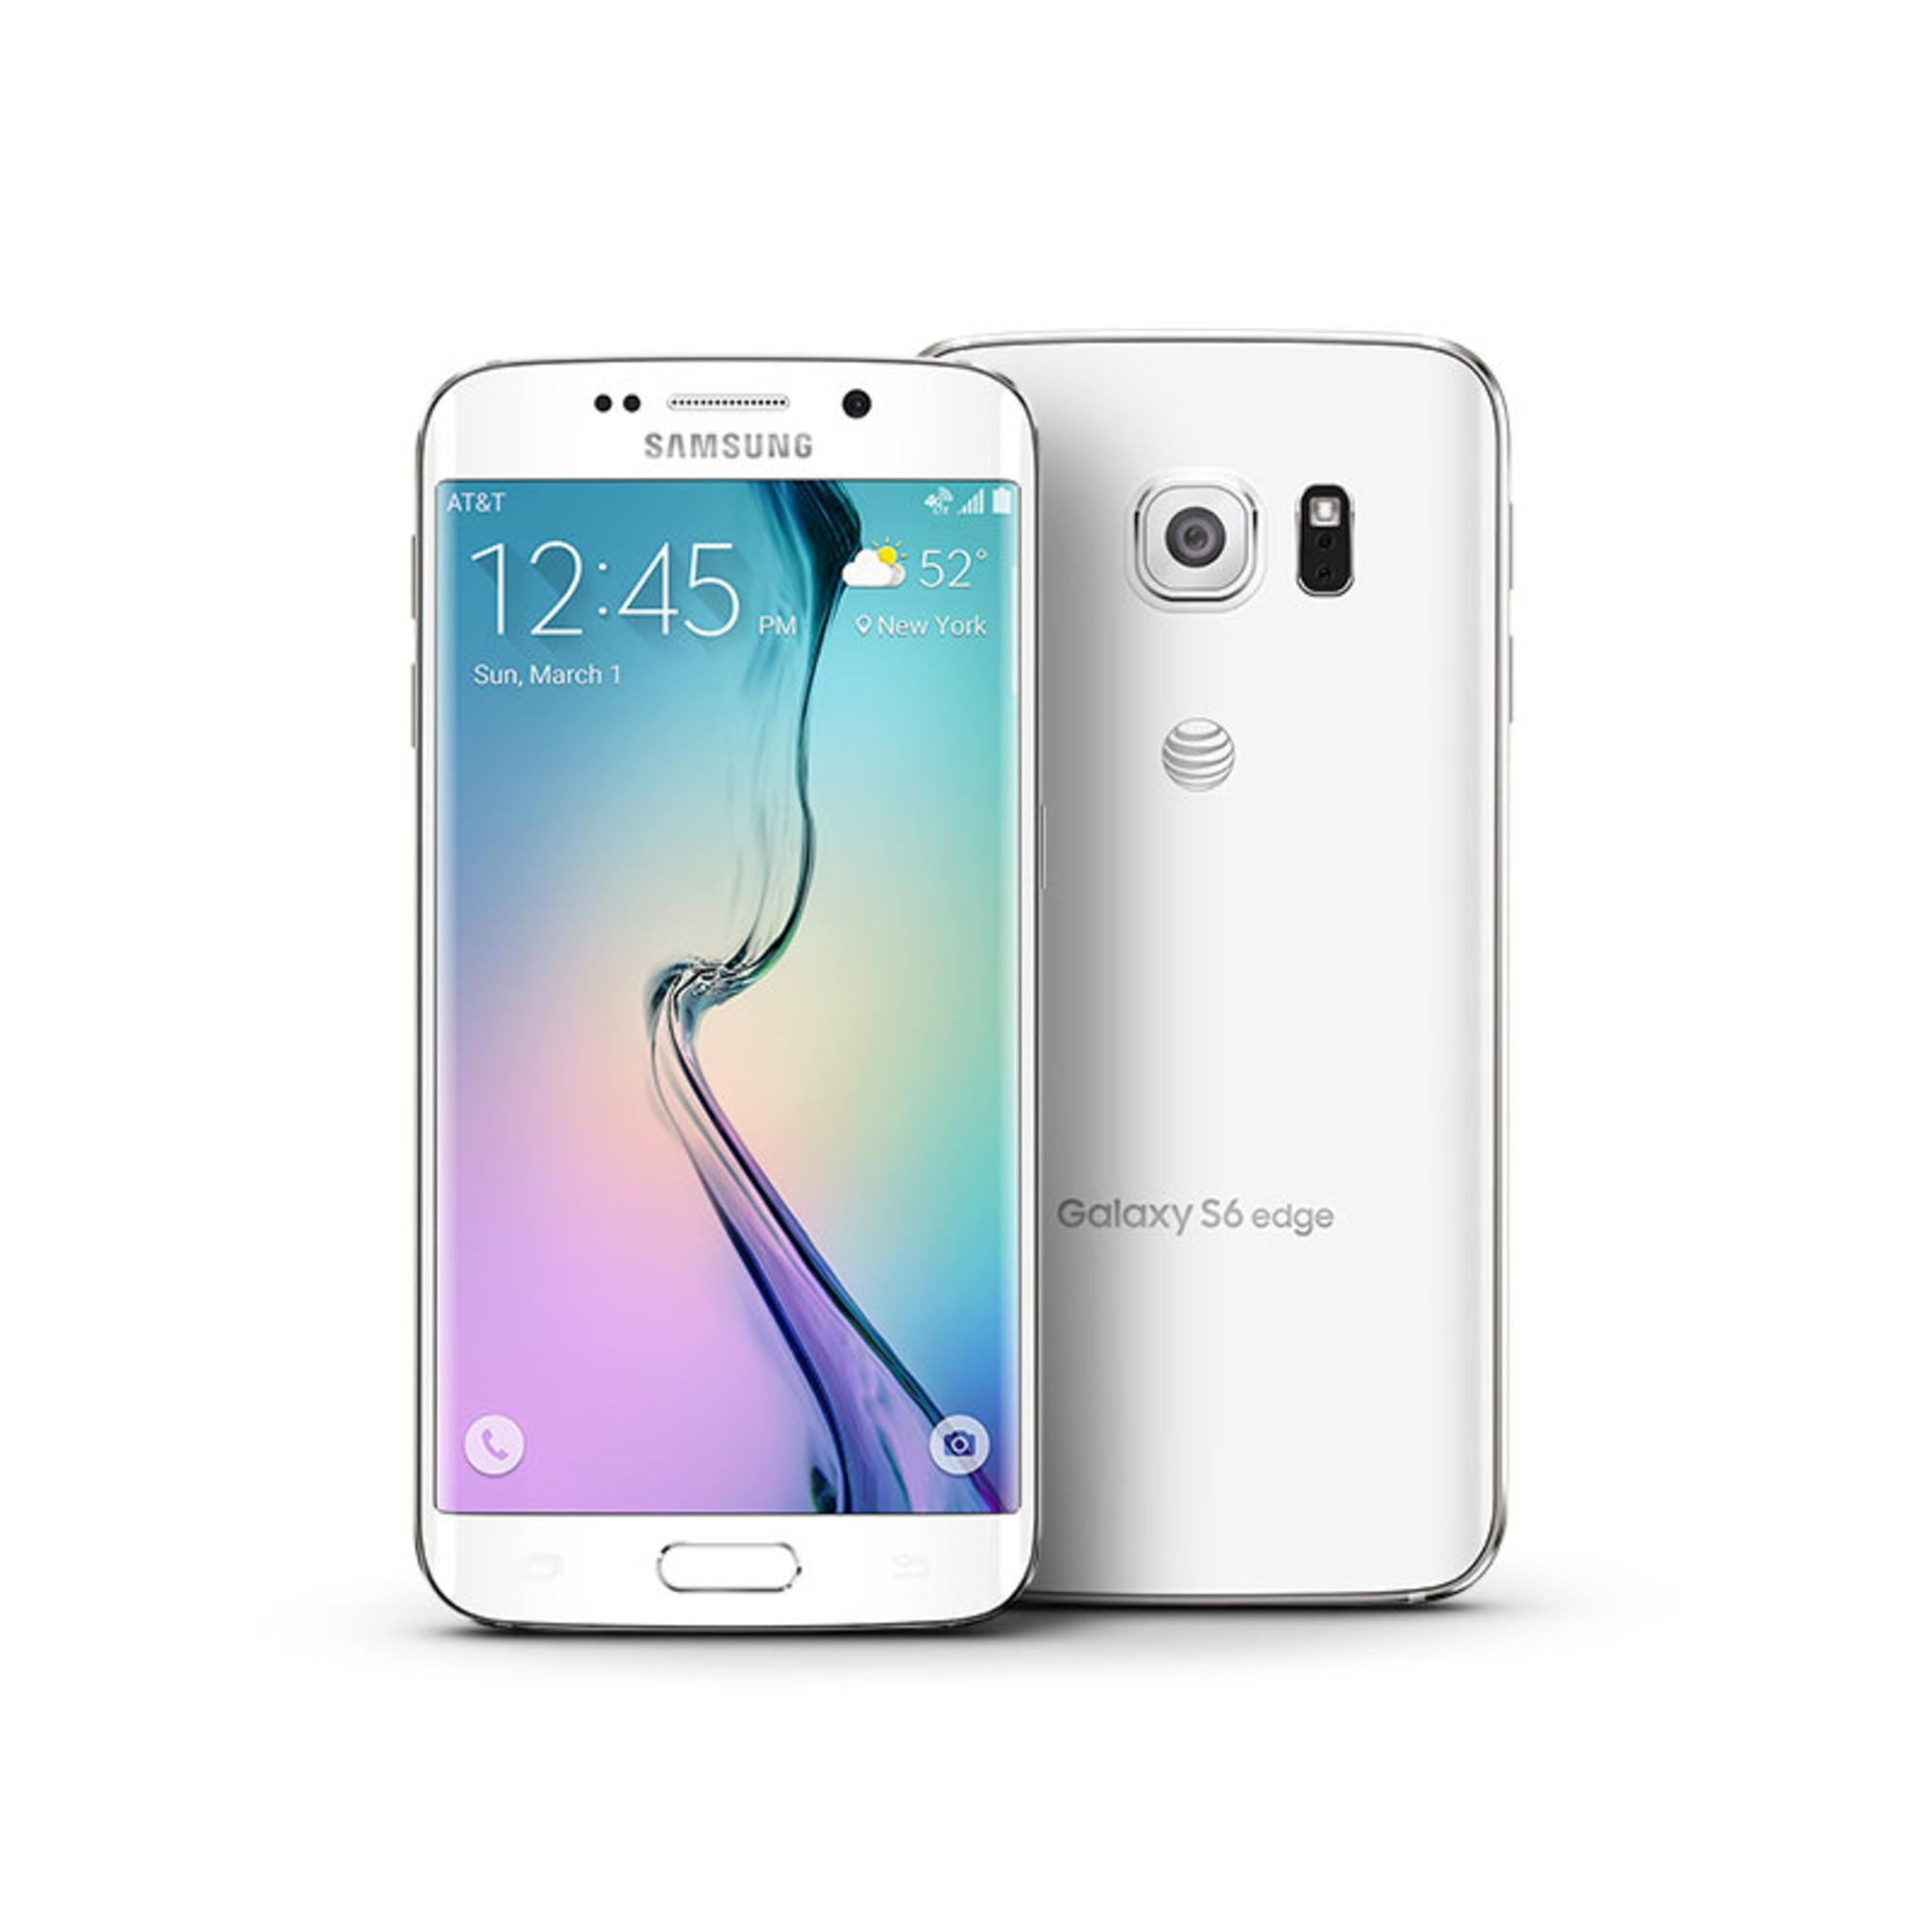 samsung galaxy s6 edge 32gb unlocked gsm lte 16mp phone certified refurbished ebay. Black Bedroom Furniture Sets. Home Design Ideas